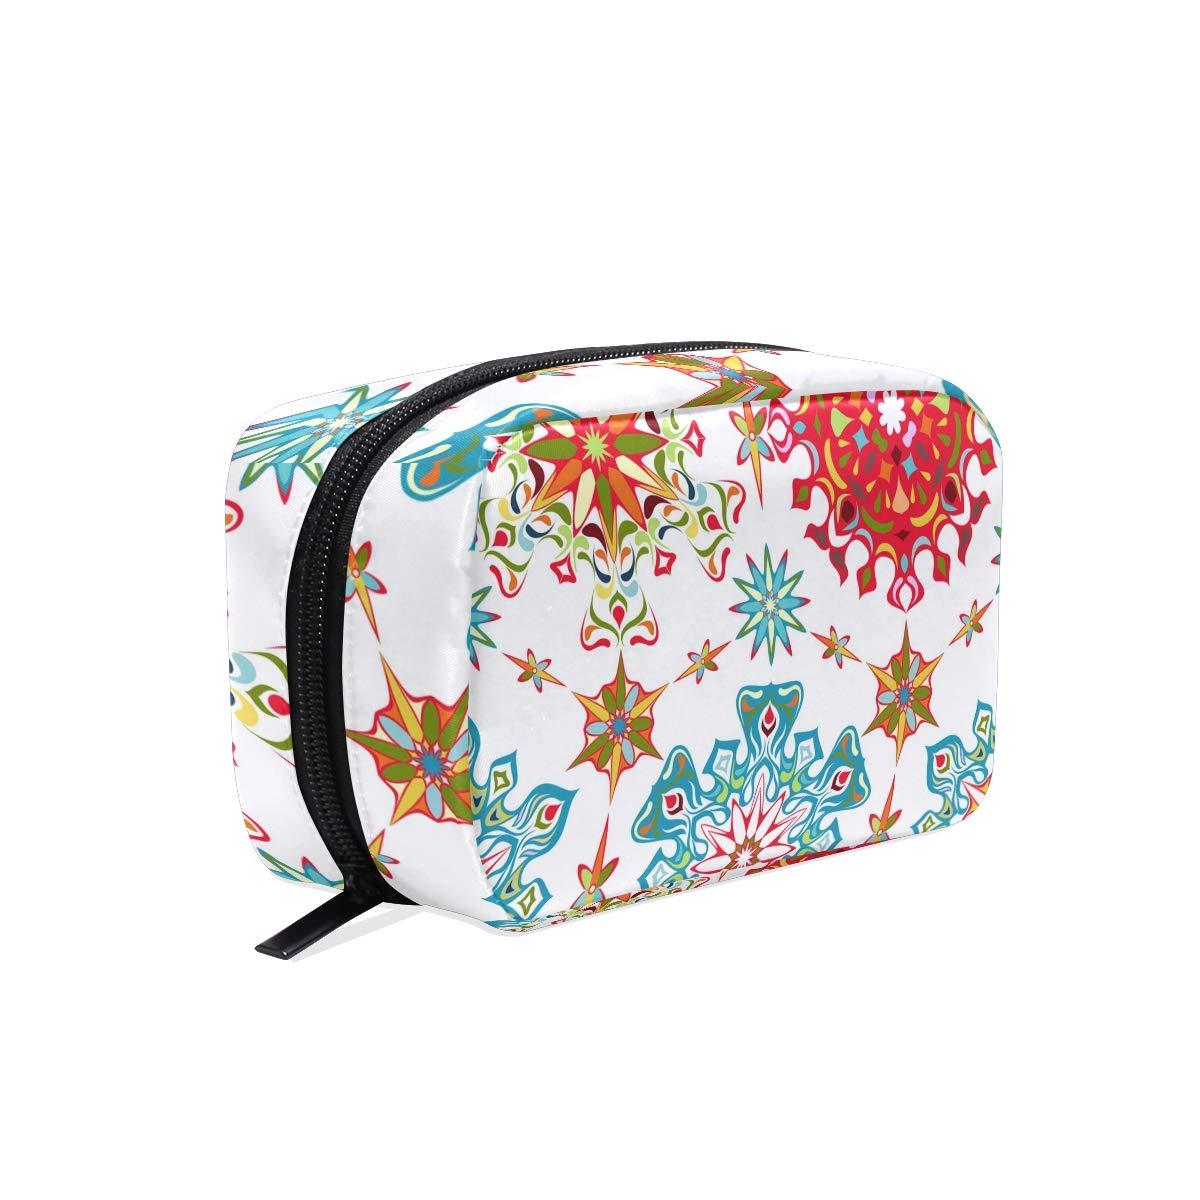 Makeup Bag Portable Travel Cosmetic Bags Roma Flowers Storage Bag for Women Skincare Makeup Train Case